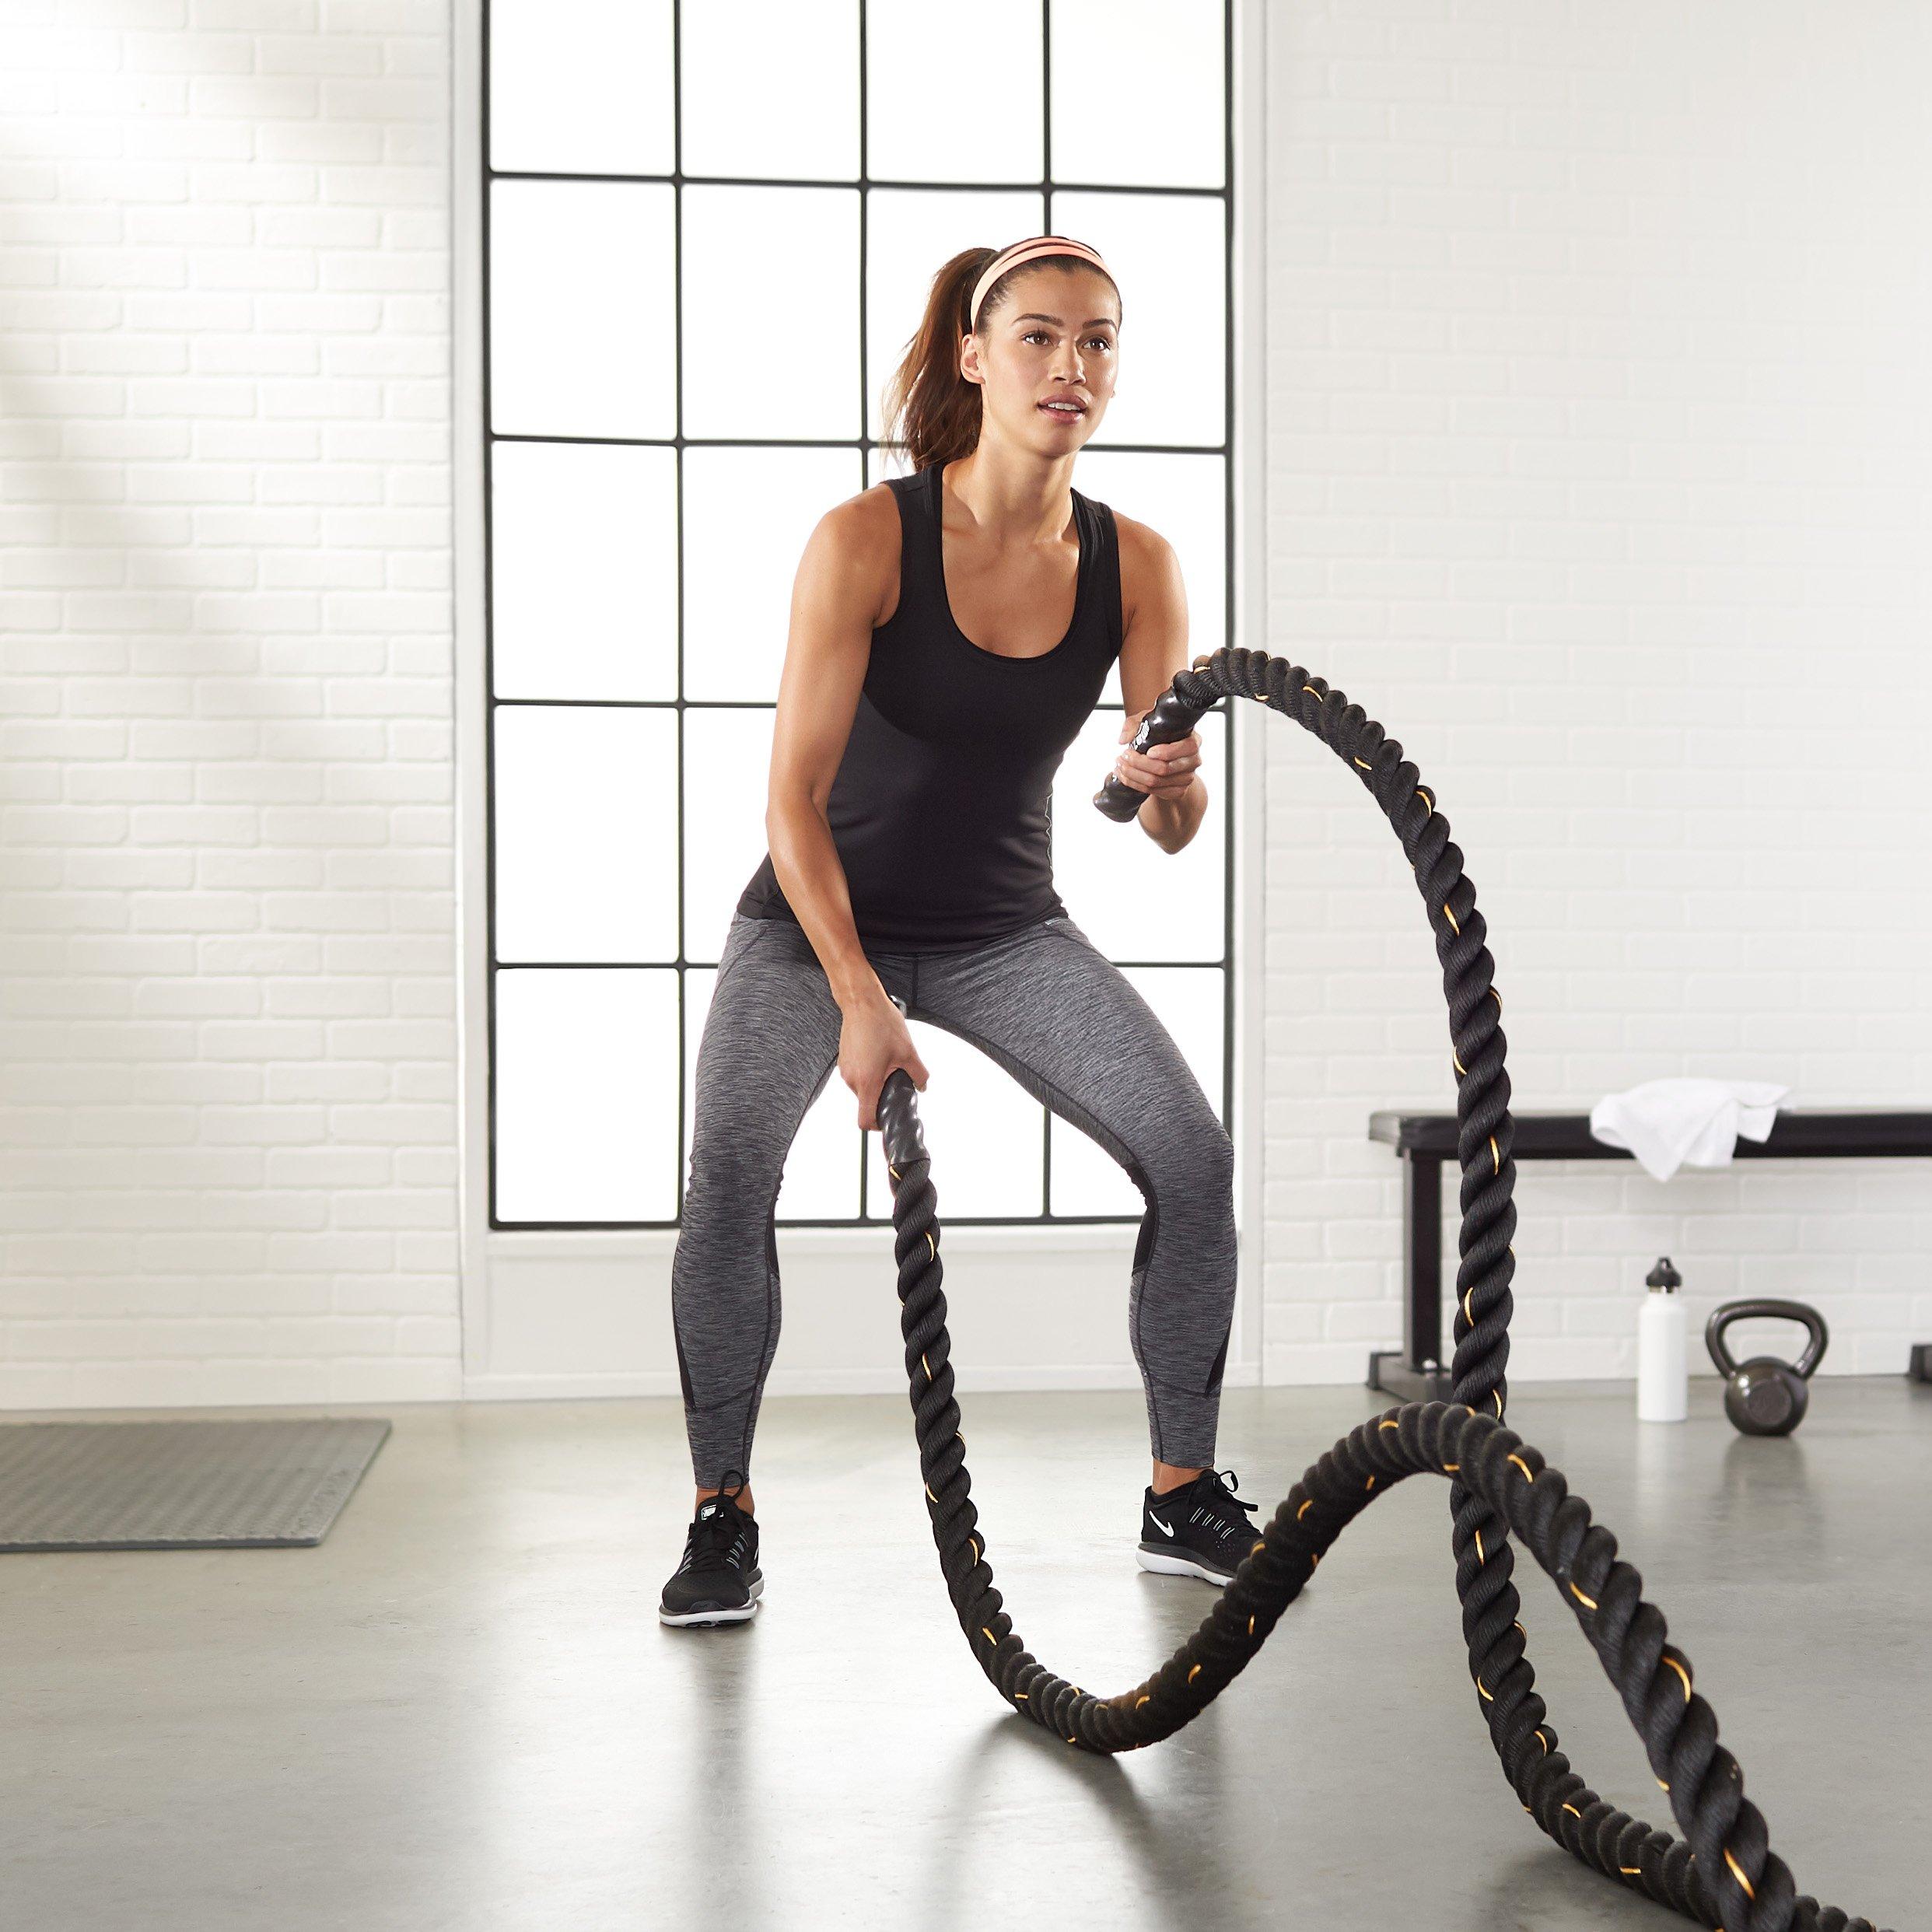 AmazonBasics 2 Inch Heavy Exercise Training Workout Battle Rope -  490*1.9*1.9 inch, Black: Buy Online at Best Price in UAE - Amazon.ae